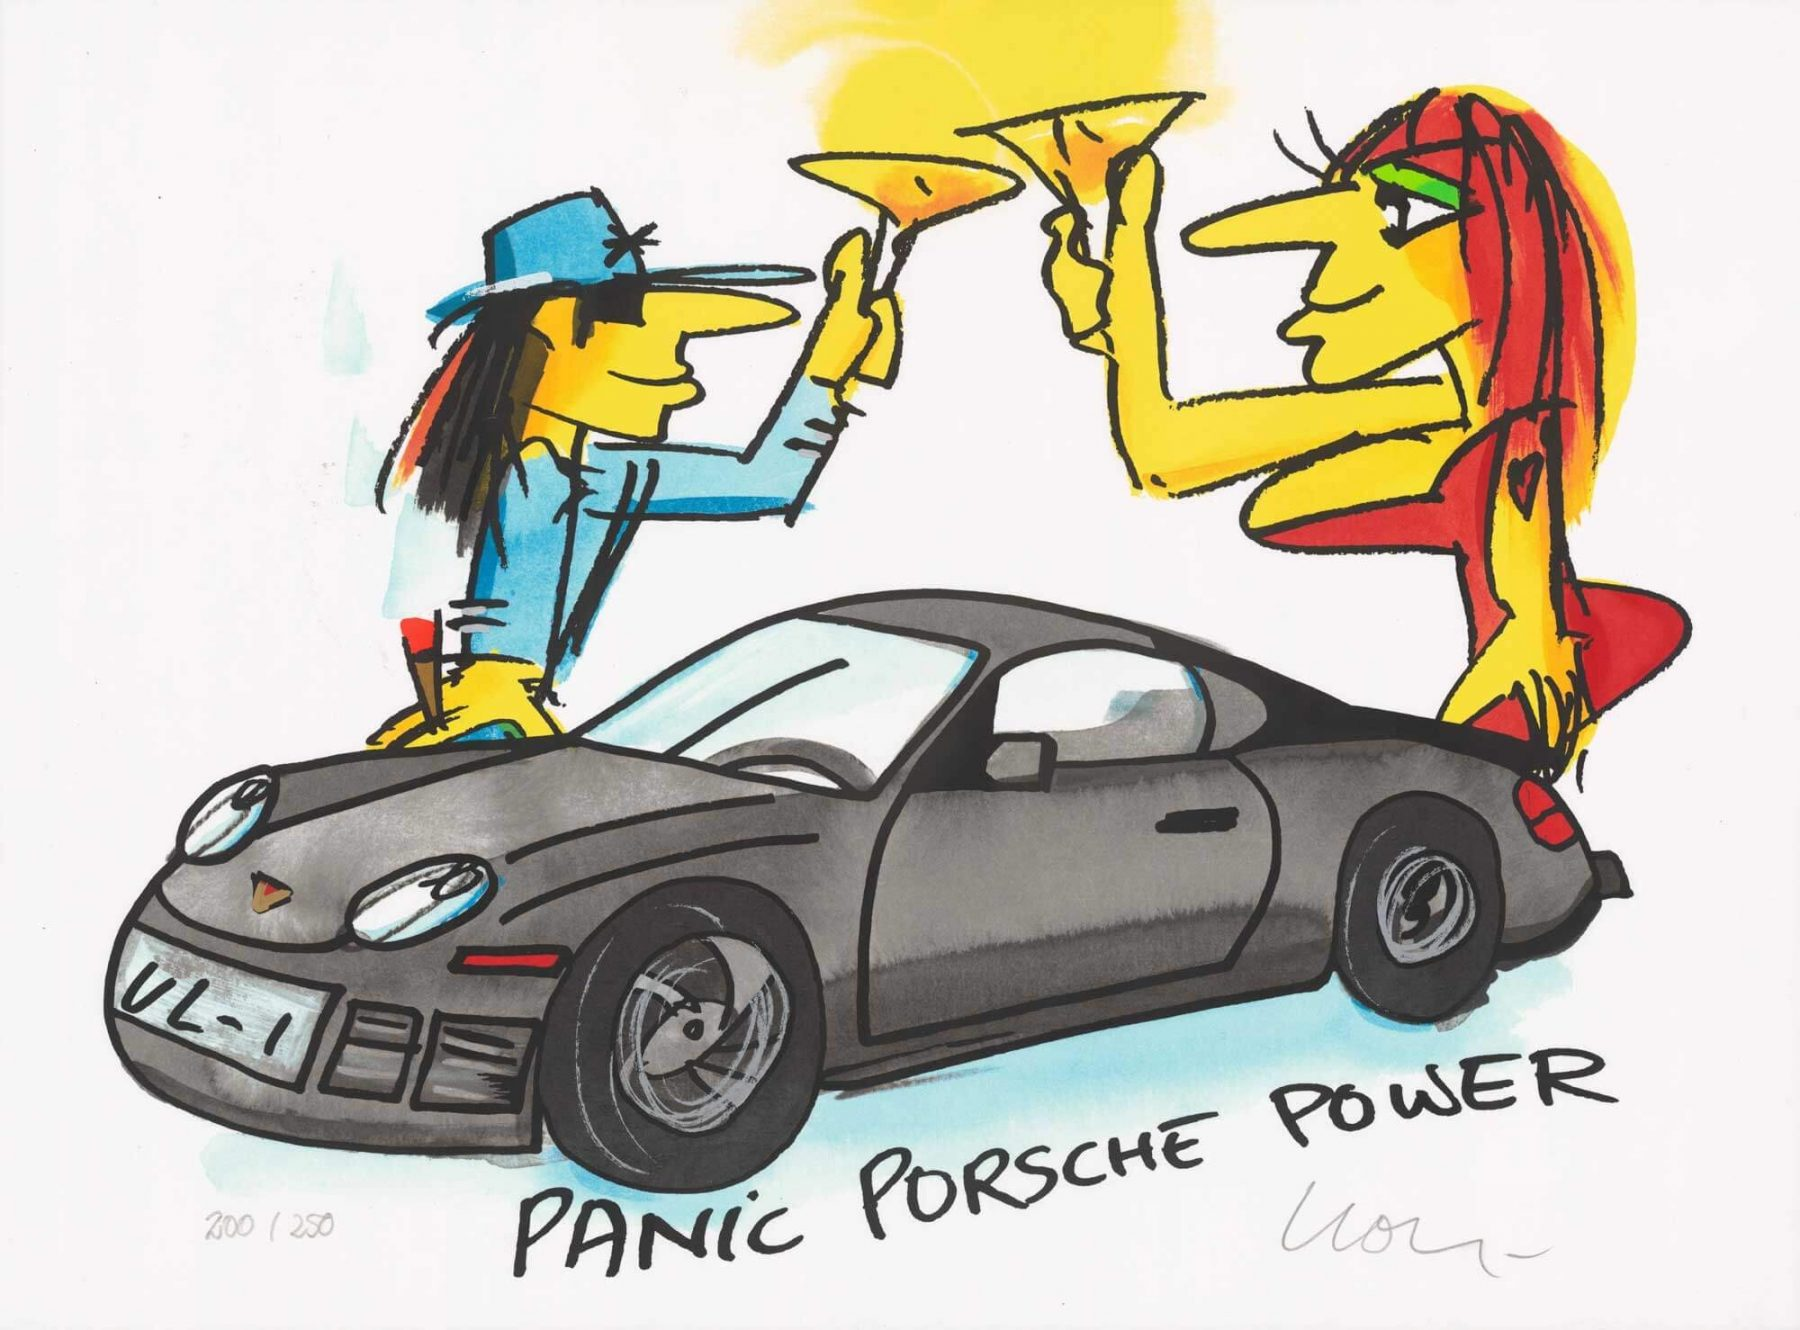 Panik Porsche Power - Lindenberg, Udo - k-2008LIN3